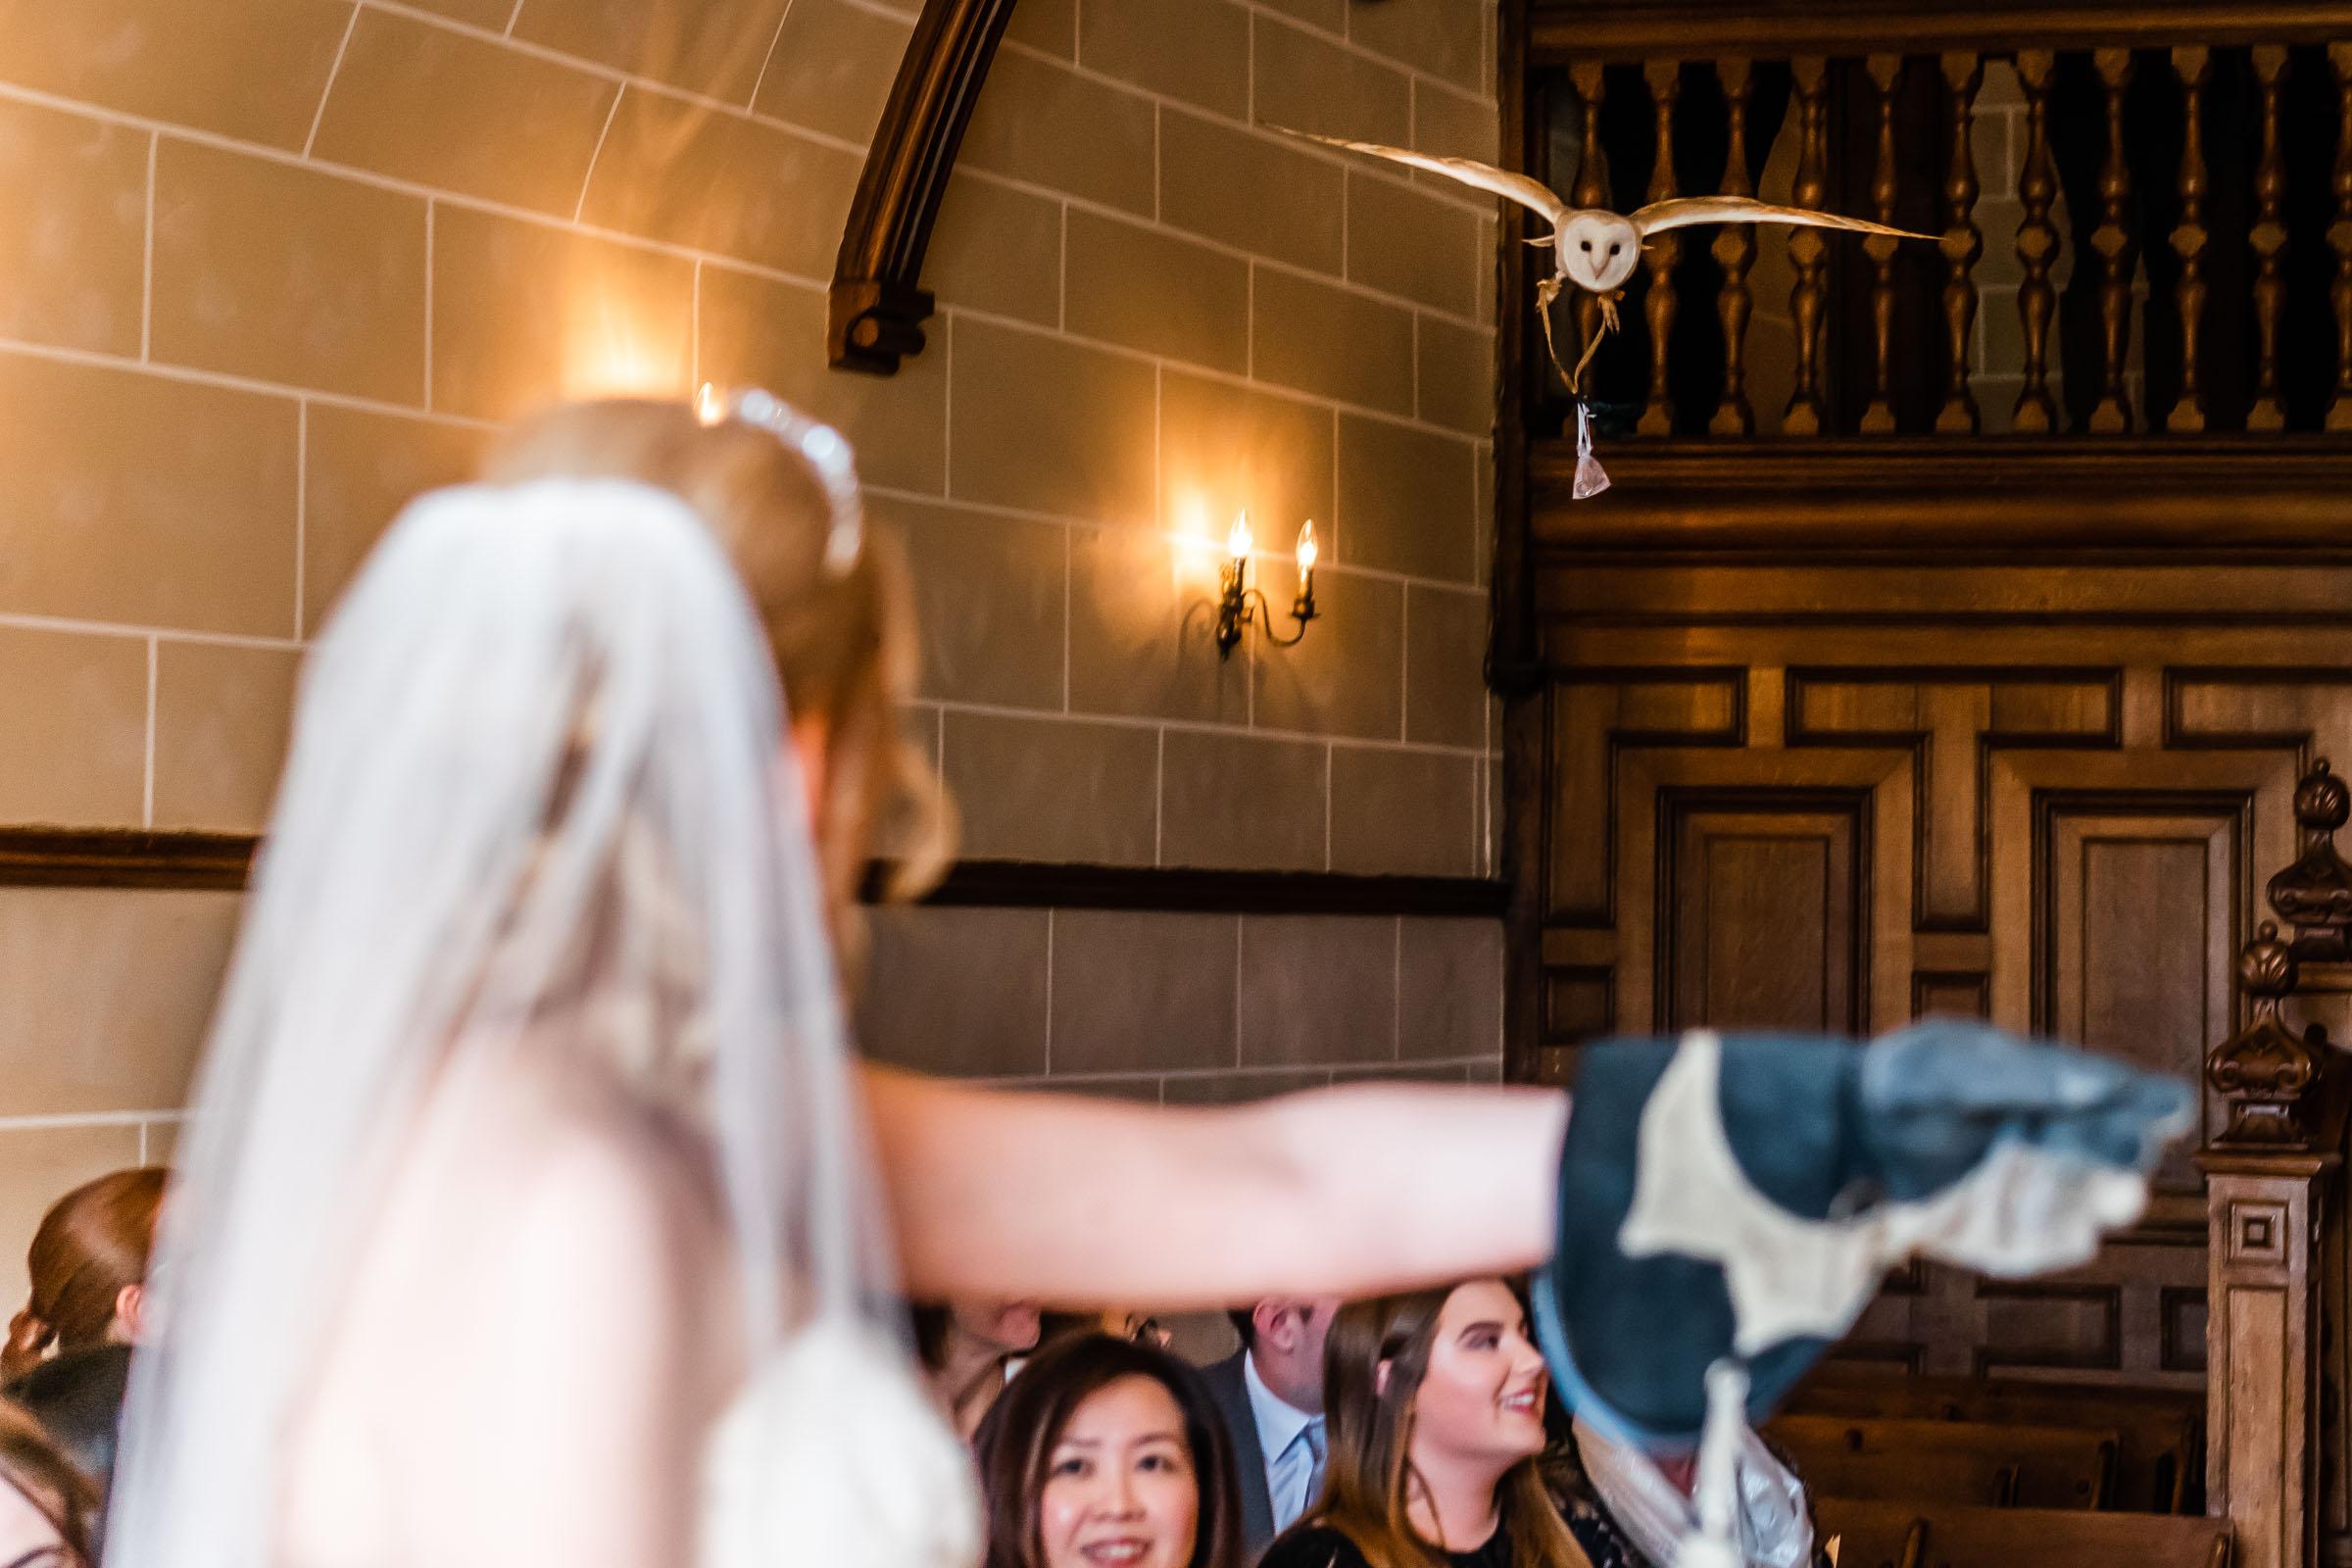 dalhousie-midlothian-wedding-dearlyphotography (2 of 10).jpg